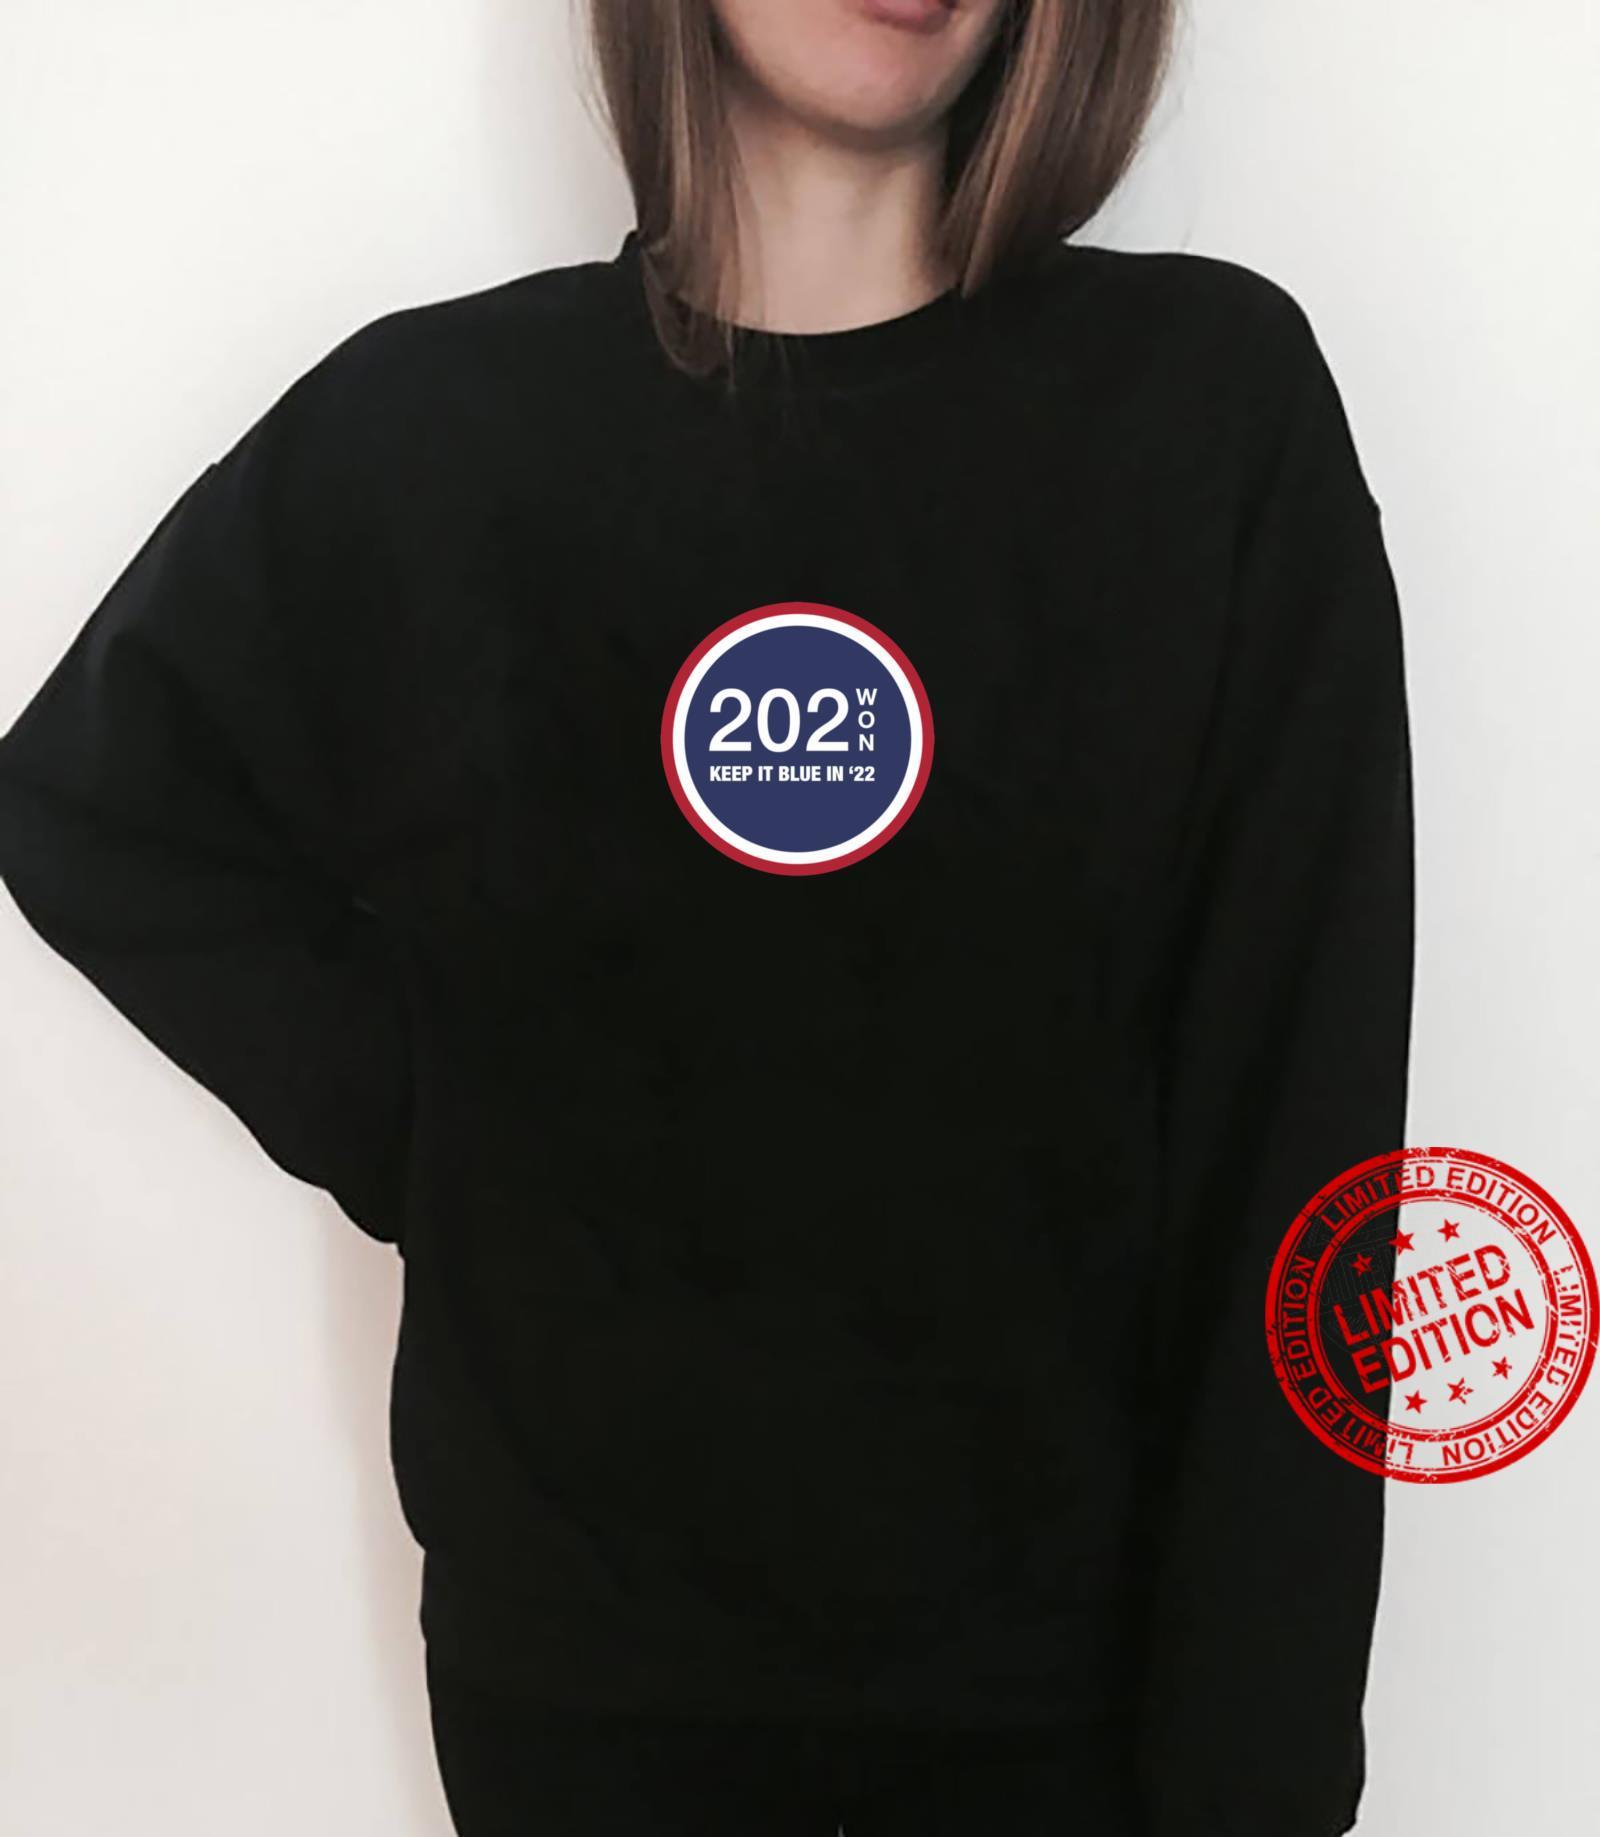 202WON, KEEP IT BLUE IN '22 Shirt sweater